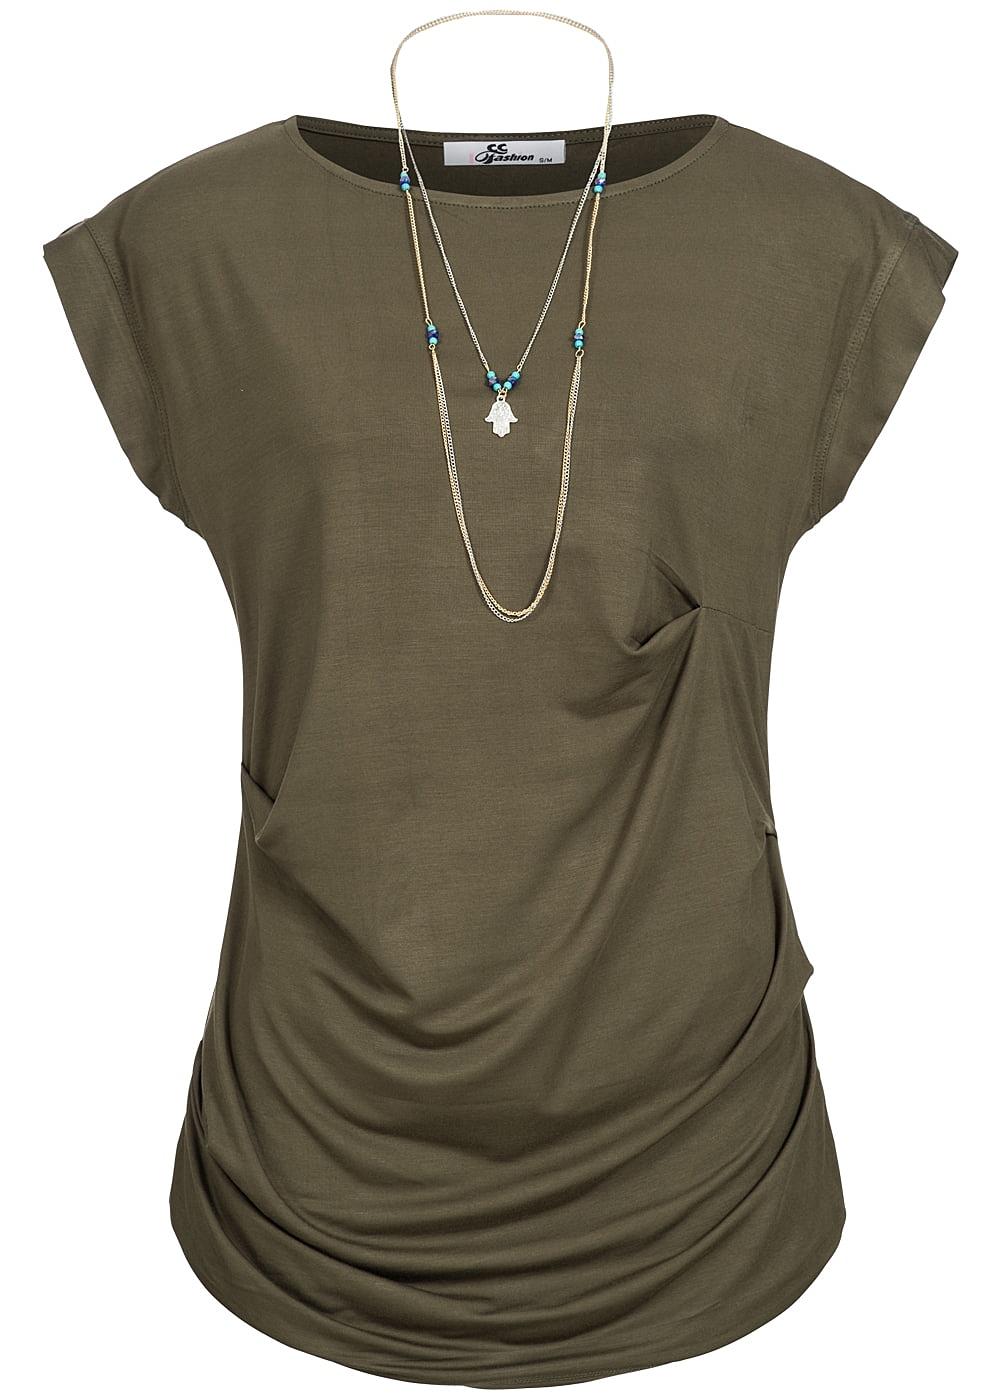 seventyseven lifestyle t shirt damen shirt mit kette kurzarm olive. Black Bedroom Furniture Sets. Home Design Ideas